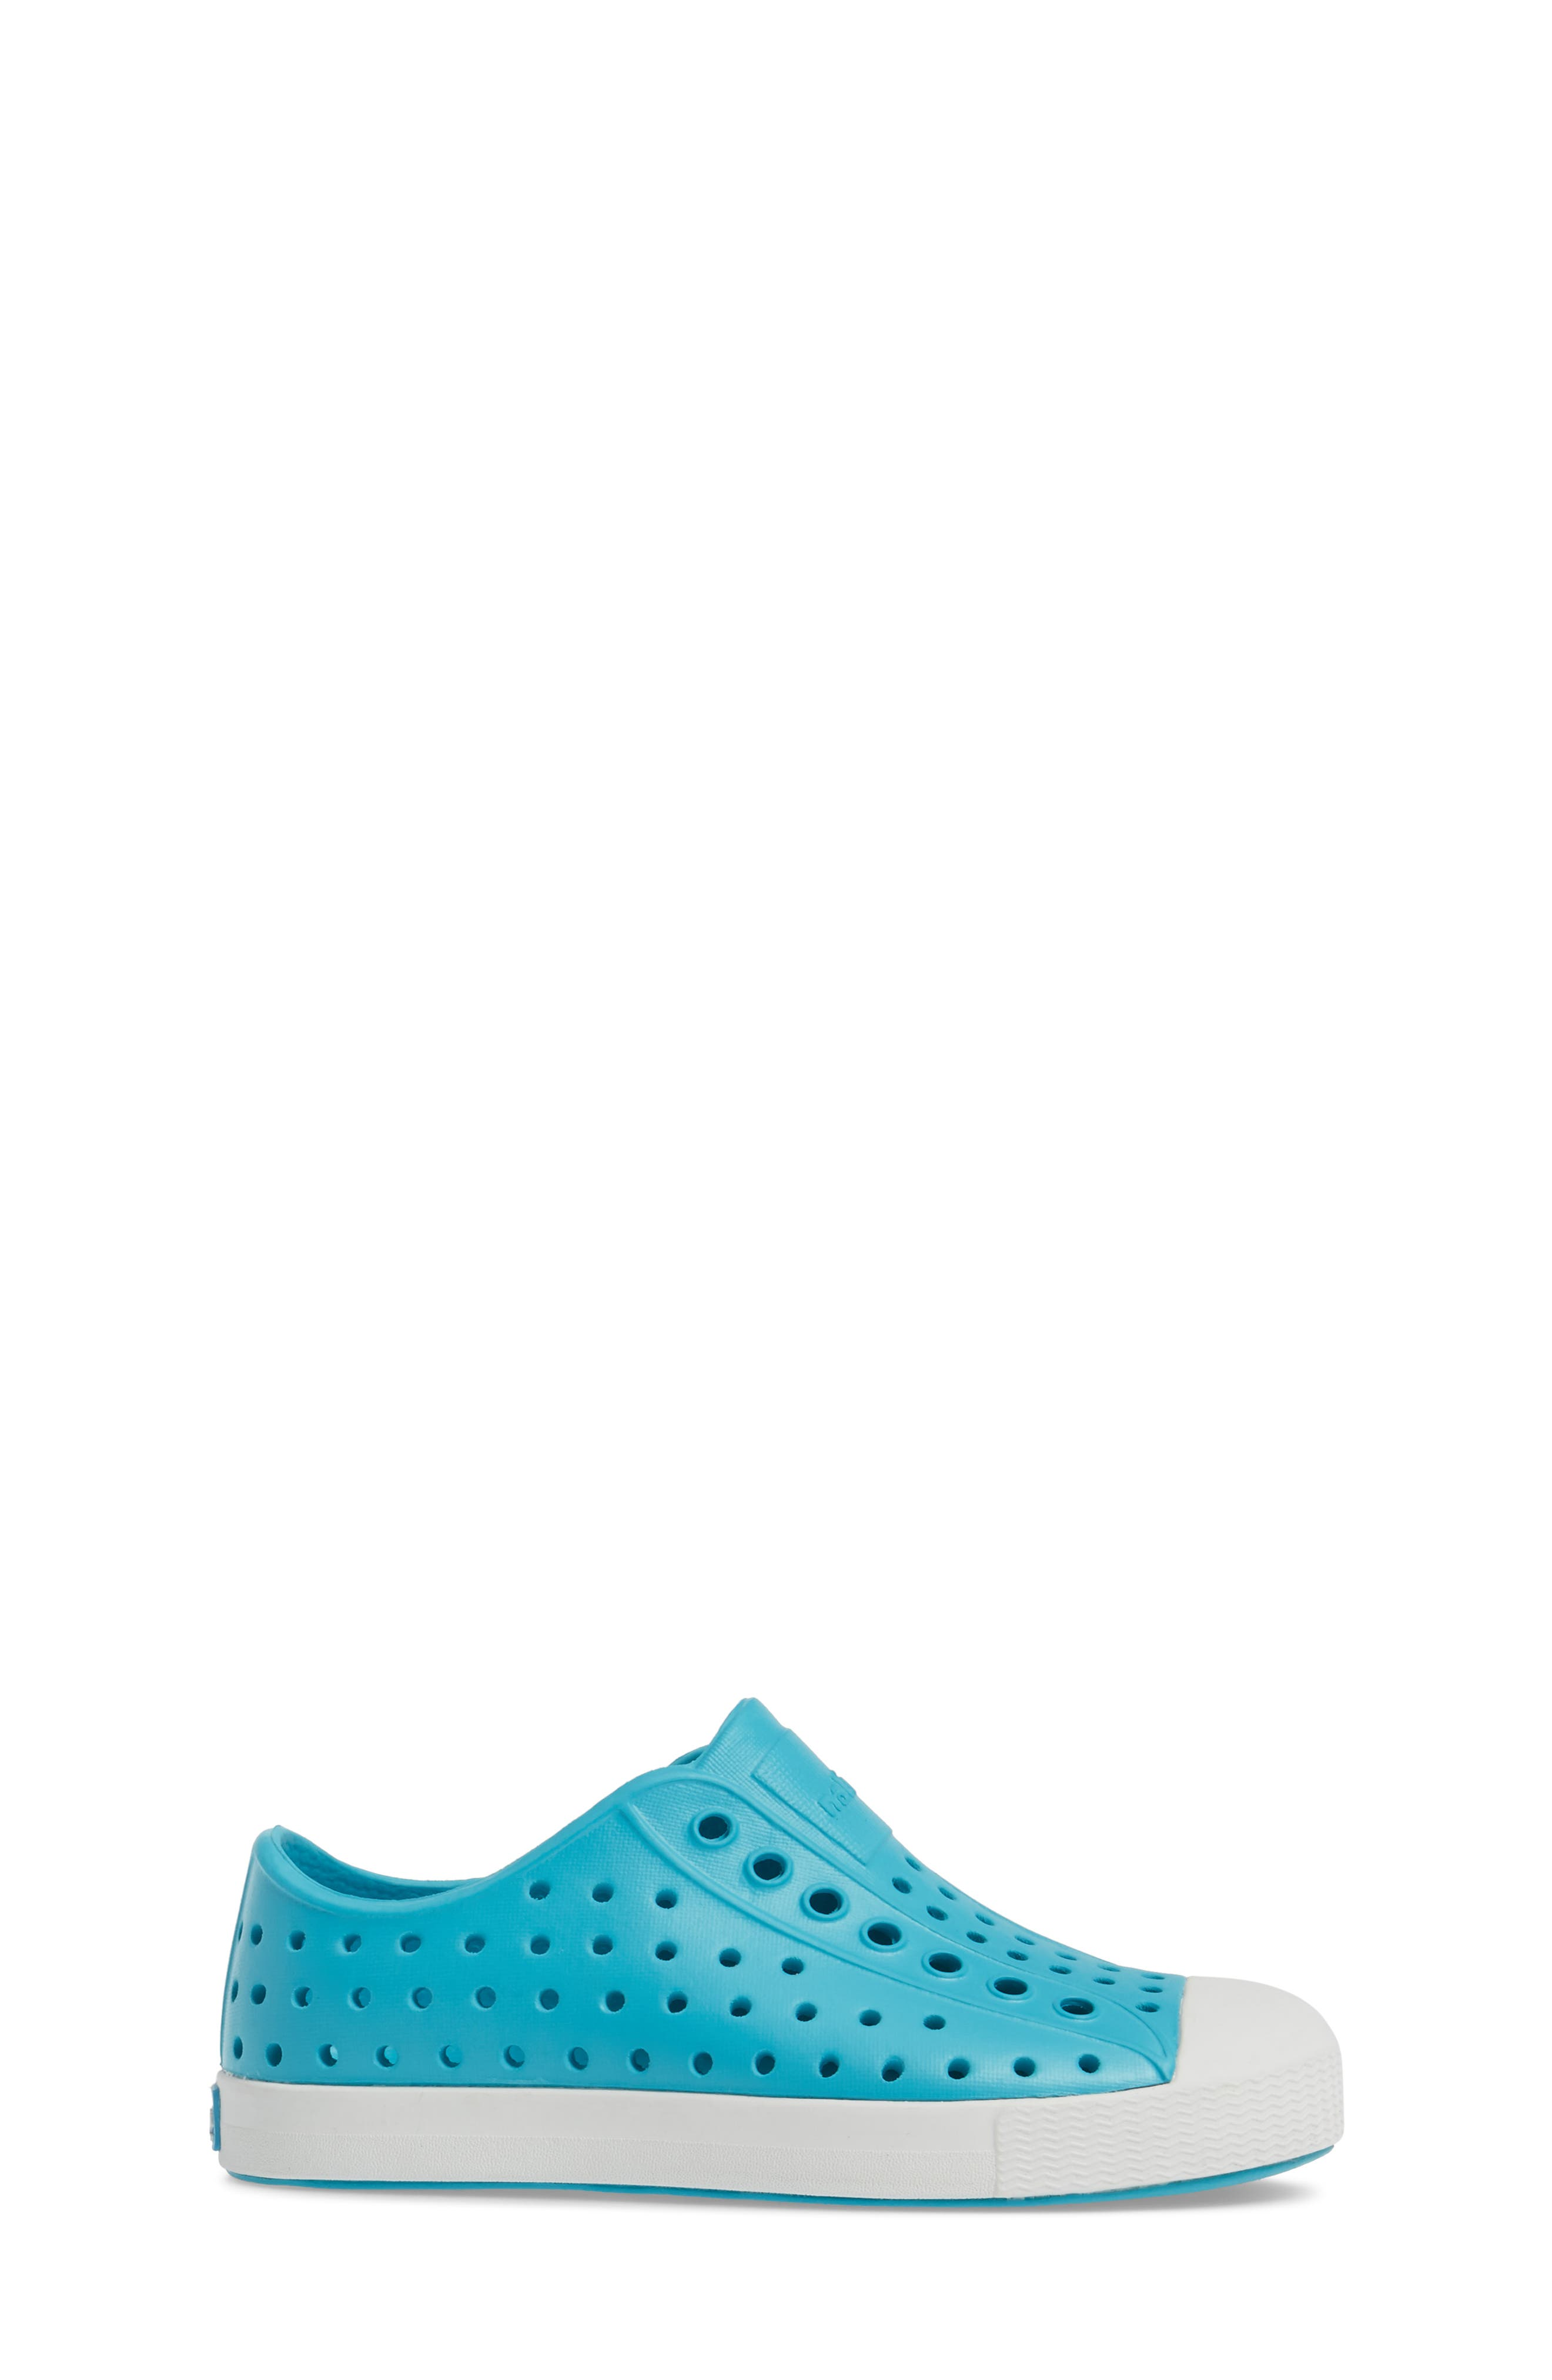 'Jefferson' Water Friendly Slip-On Sneaker,                             Alternate thumbnail 150, color,